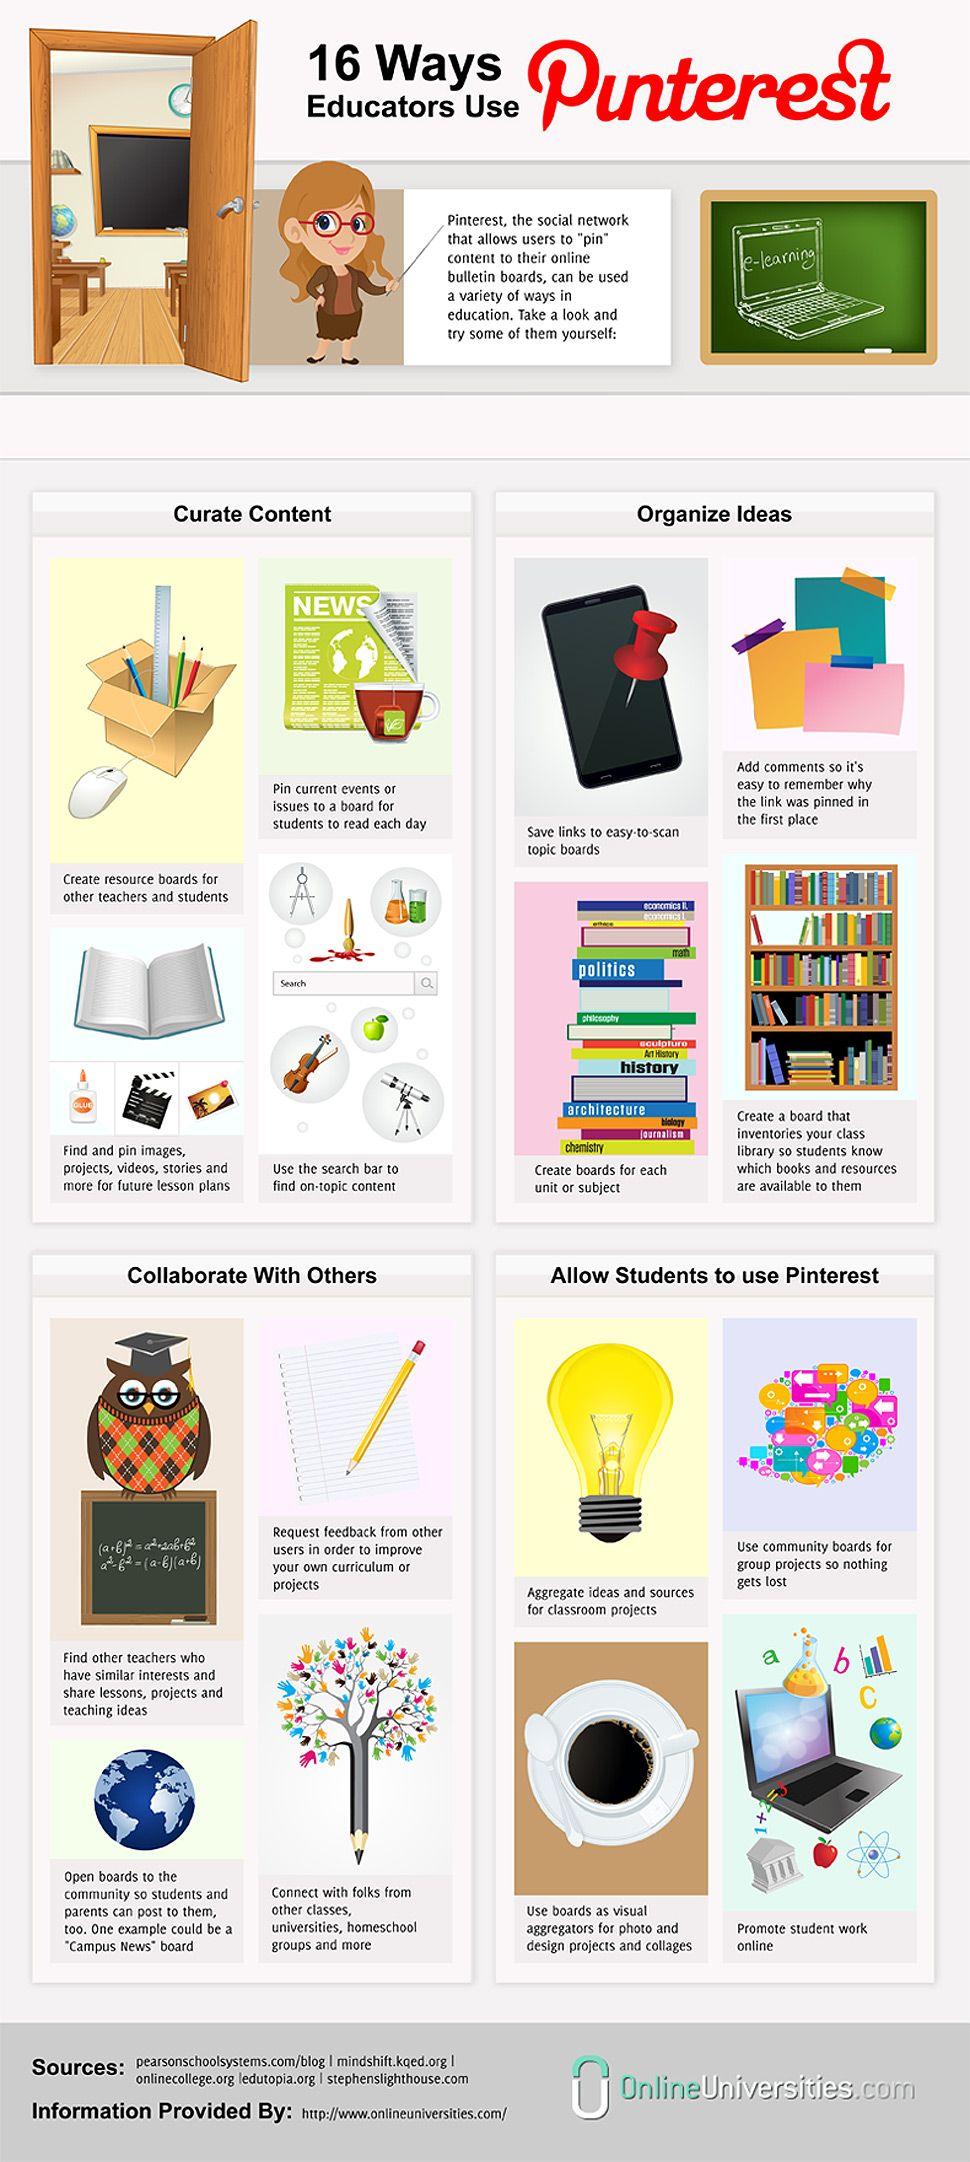 16 Ways How Educators Use Pinterest